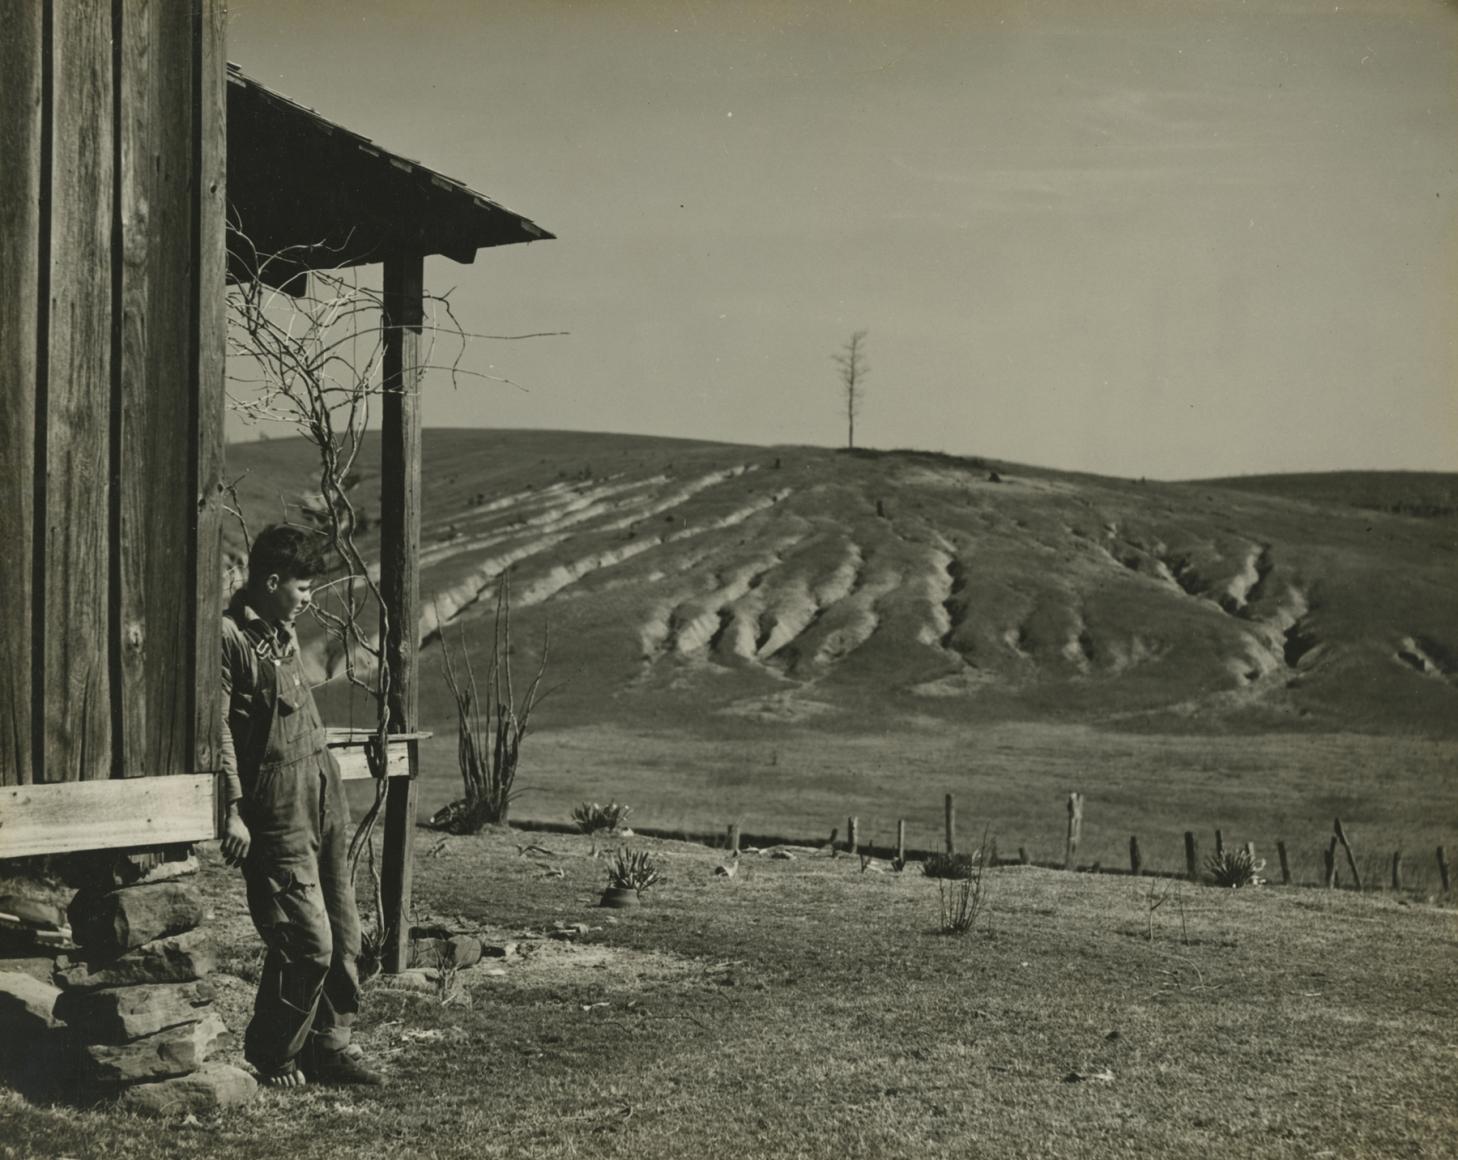 Arthur Rothstein  Eroded land on tenant's farm, Walker County, Alabama, 1937 Gelatin silver print; printed c.1937 7 5/8 x 9 1/2 inches, Howard greenberg gallery, 2020